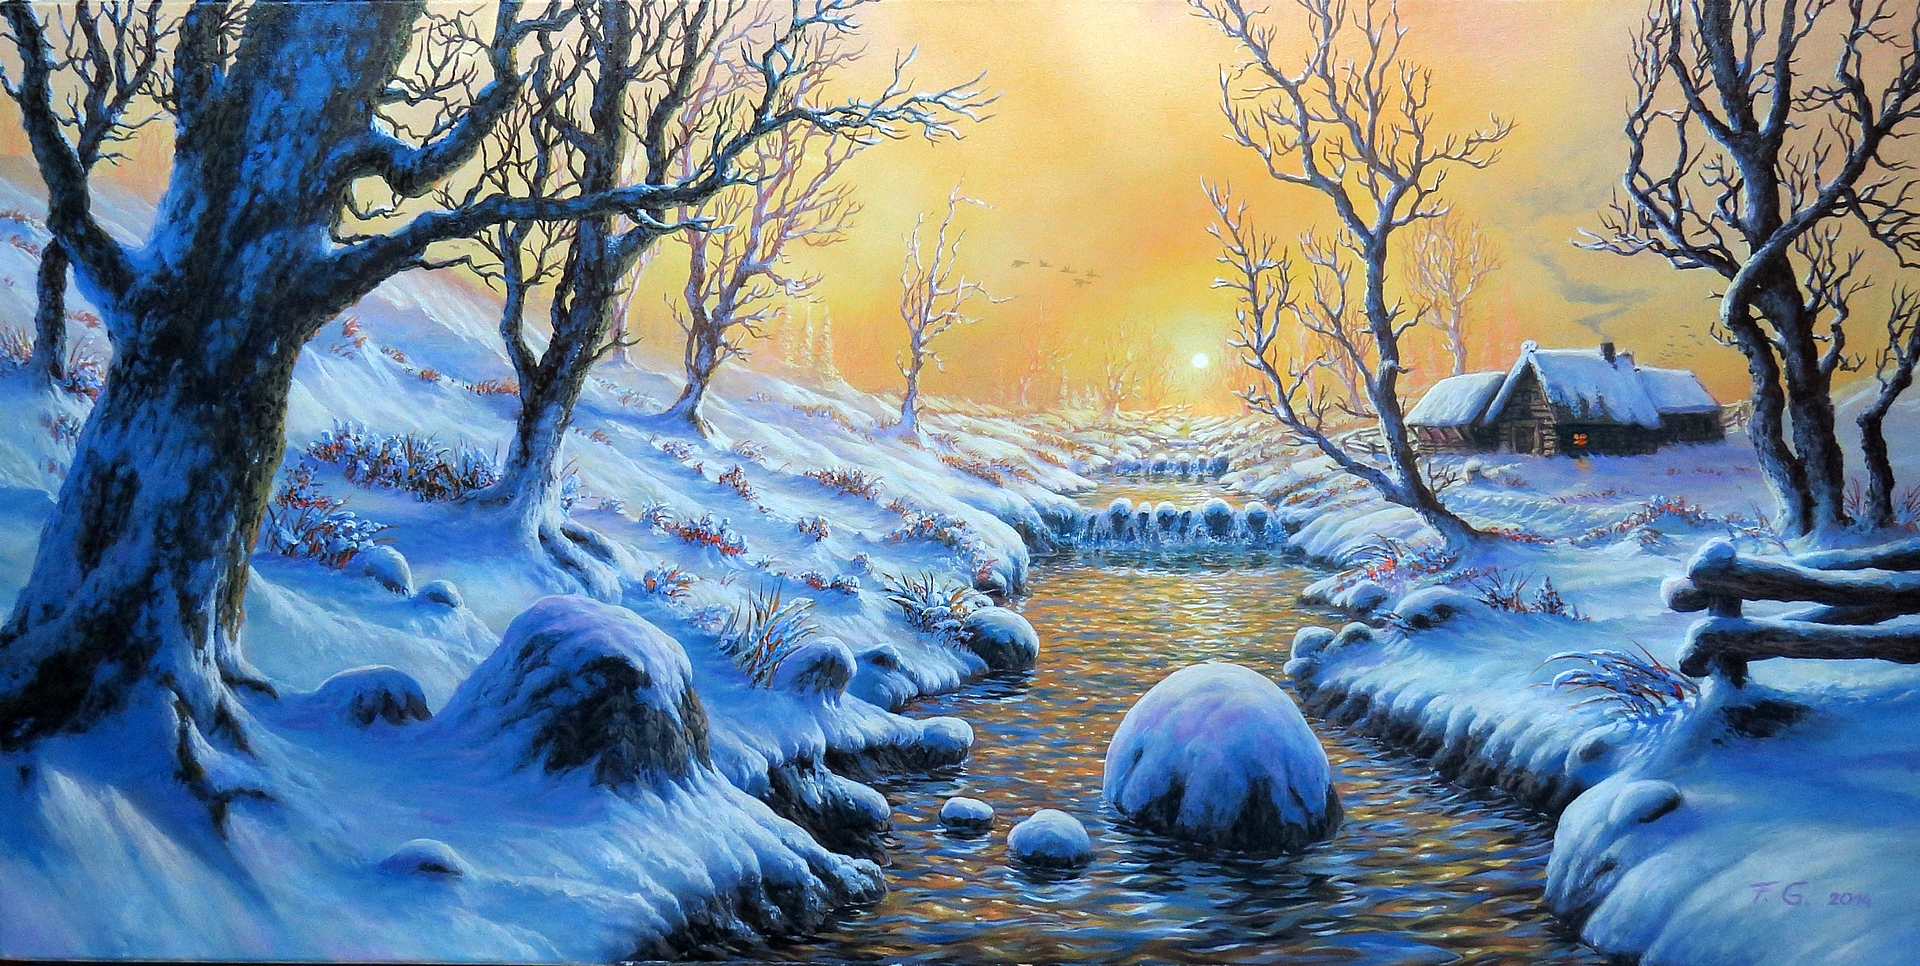 Winter morning by Fel-X